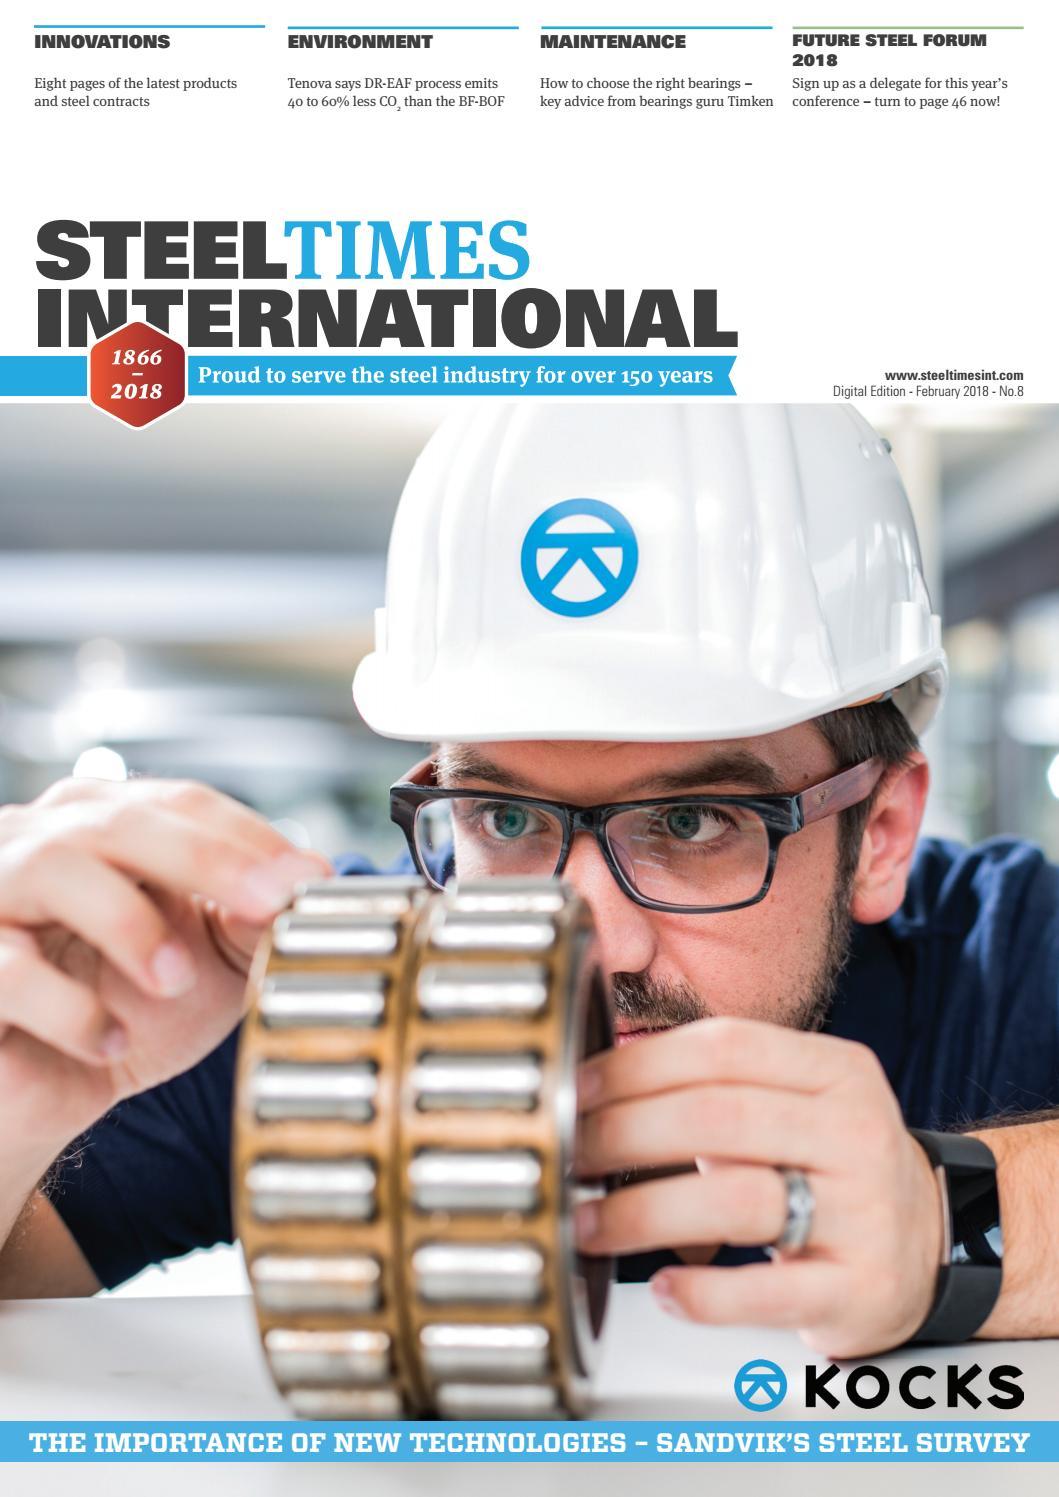 Steel Times International Digital February 2018 by Quartz Business